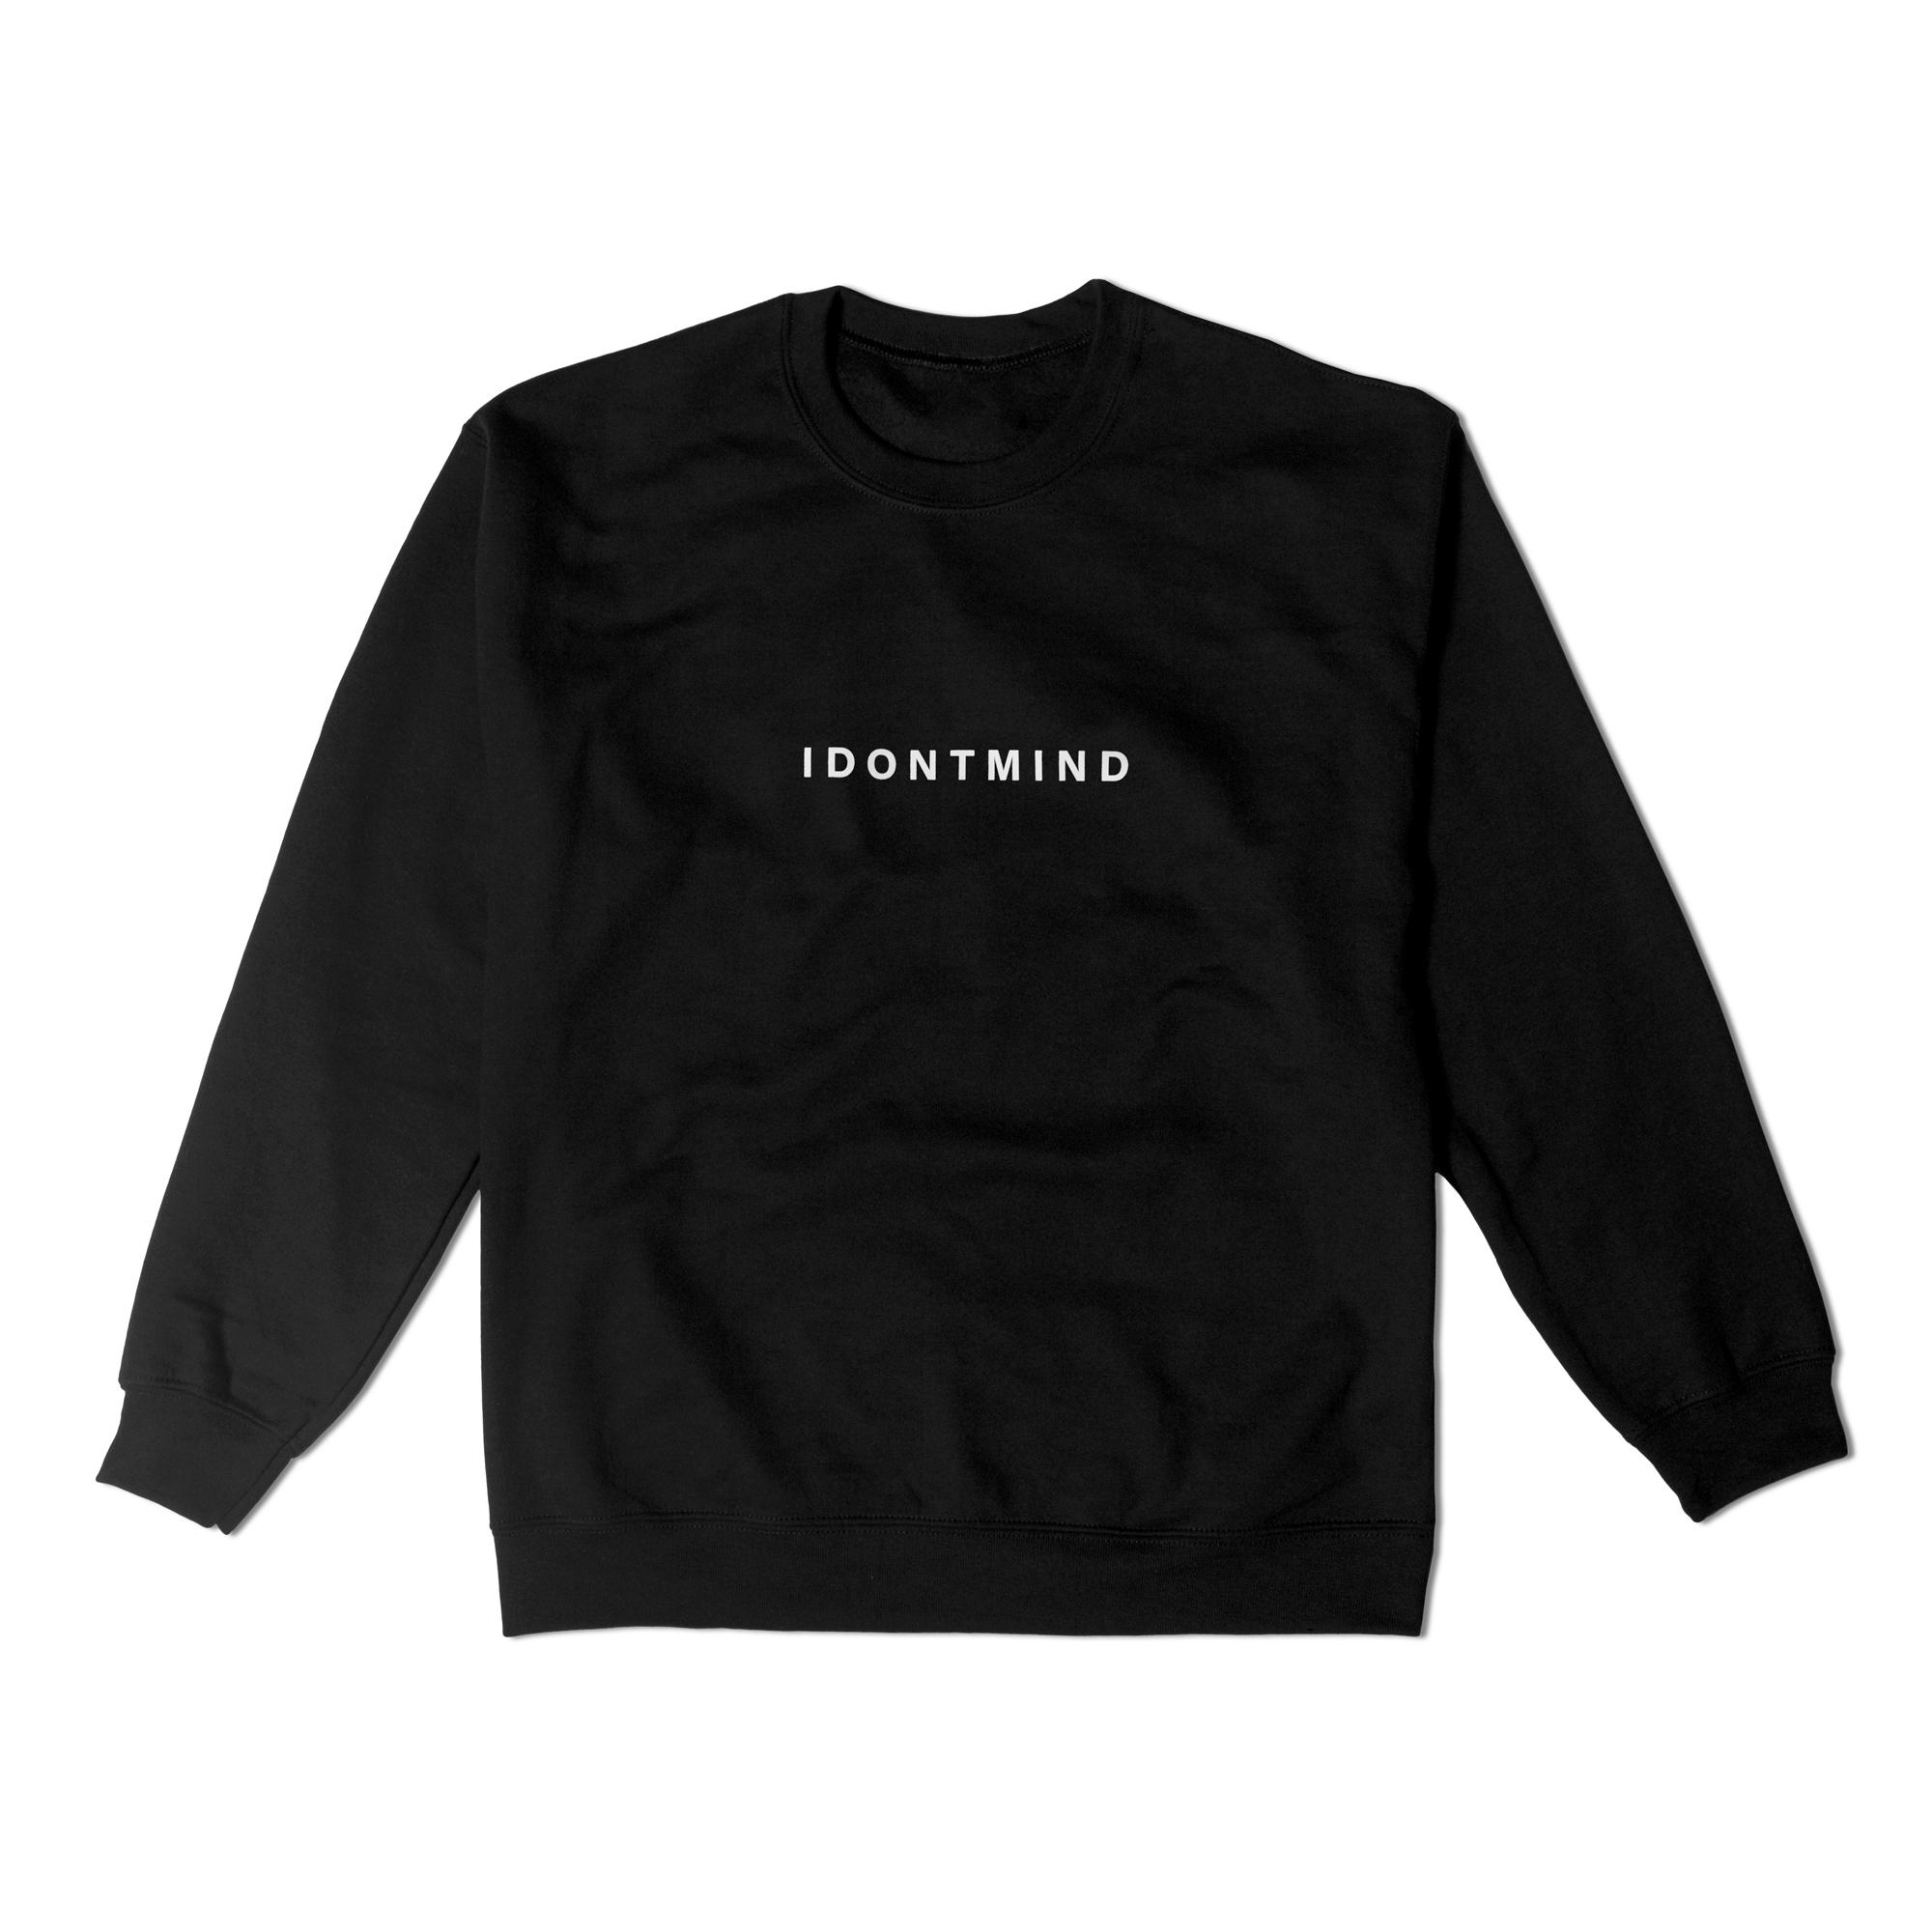 IDONTMIND-Sweatshirt.jpg